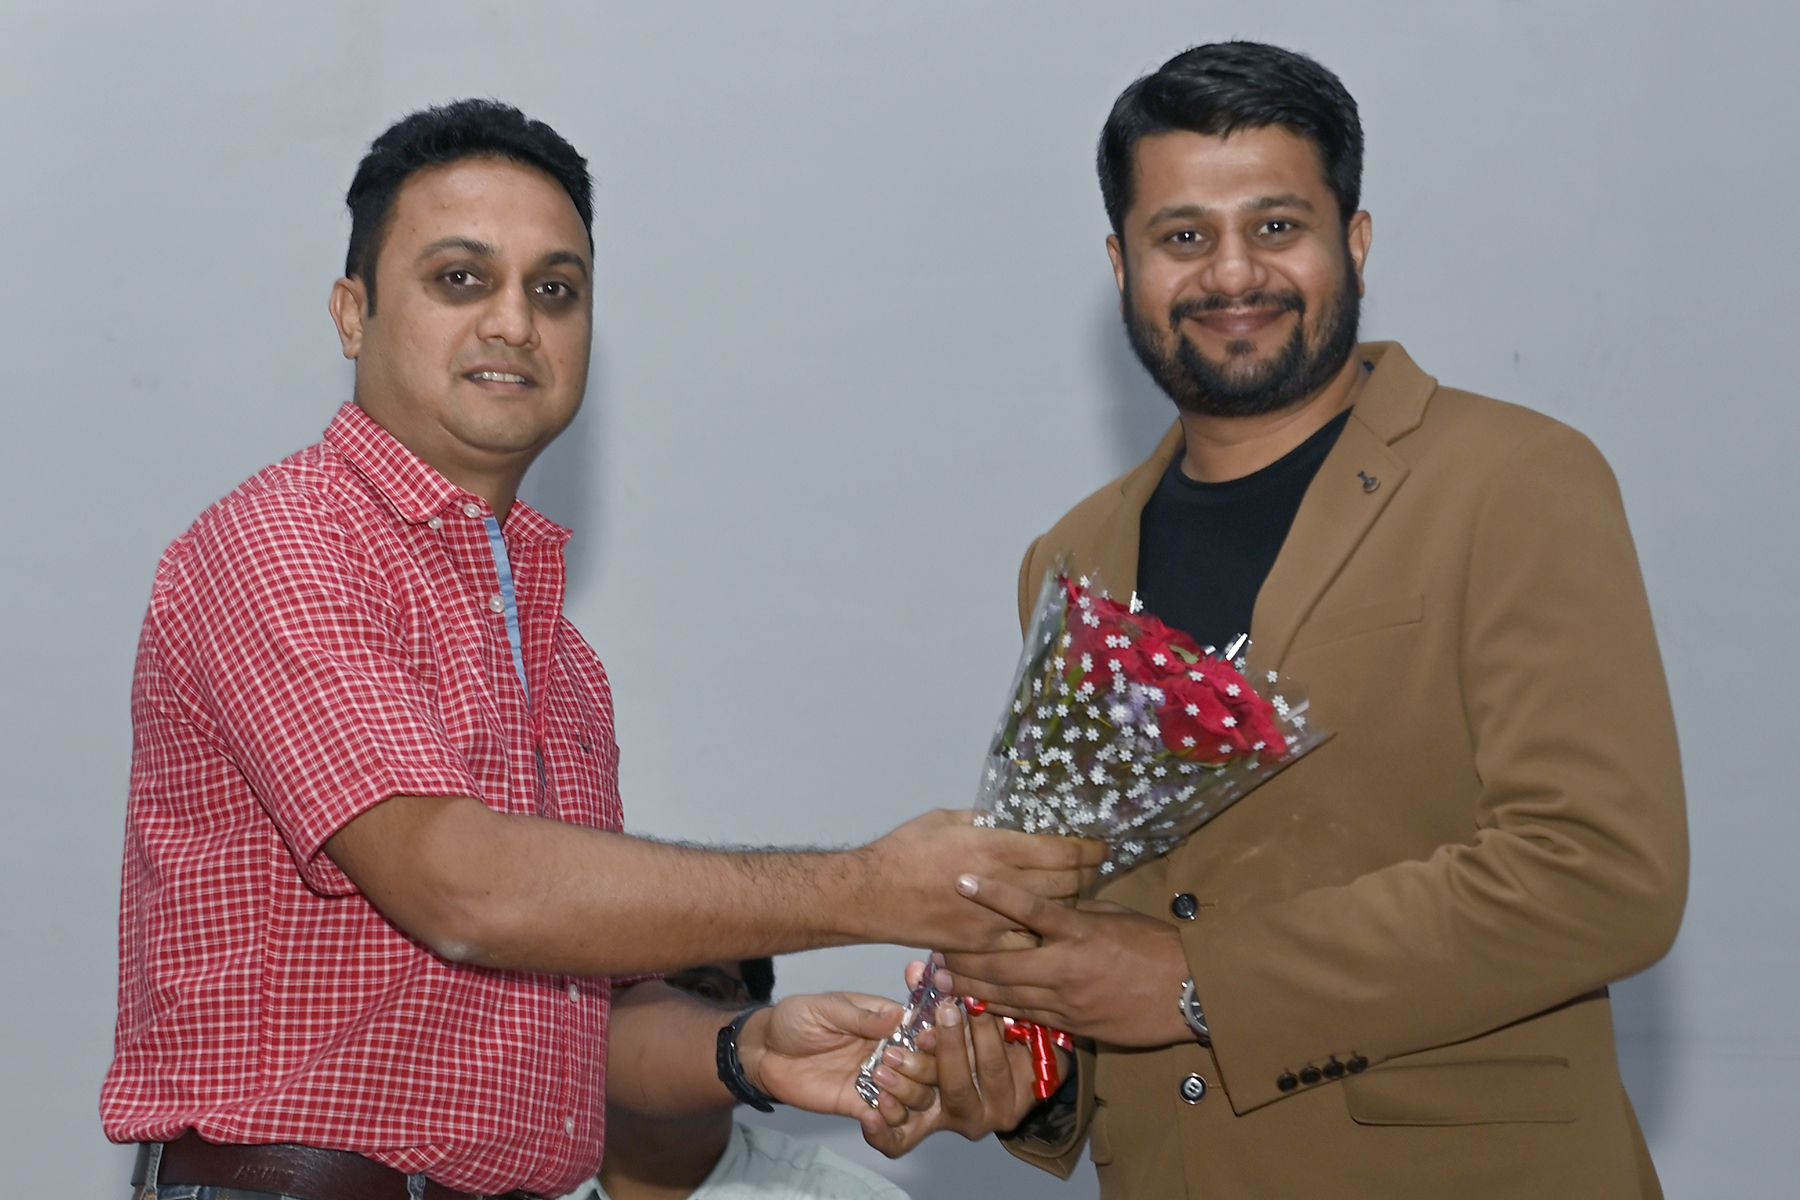 Some Pictures Of Seminar At Belgaum Foundry Cluster, Belgaum, Karnataka